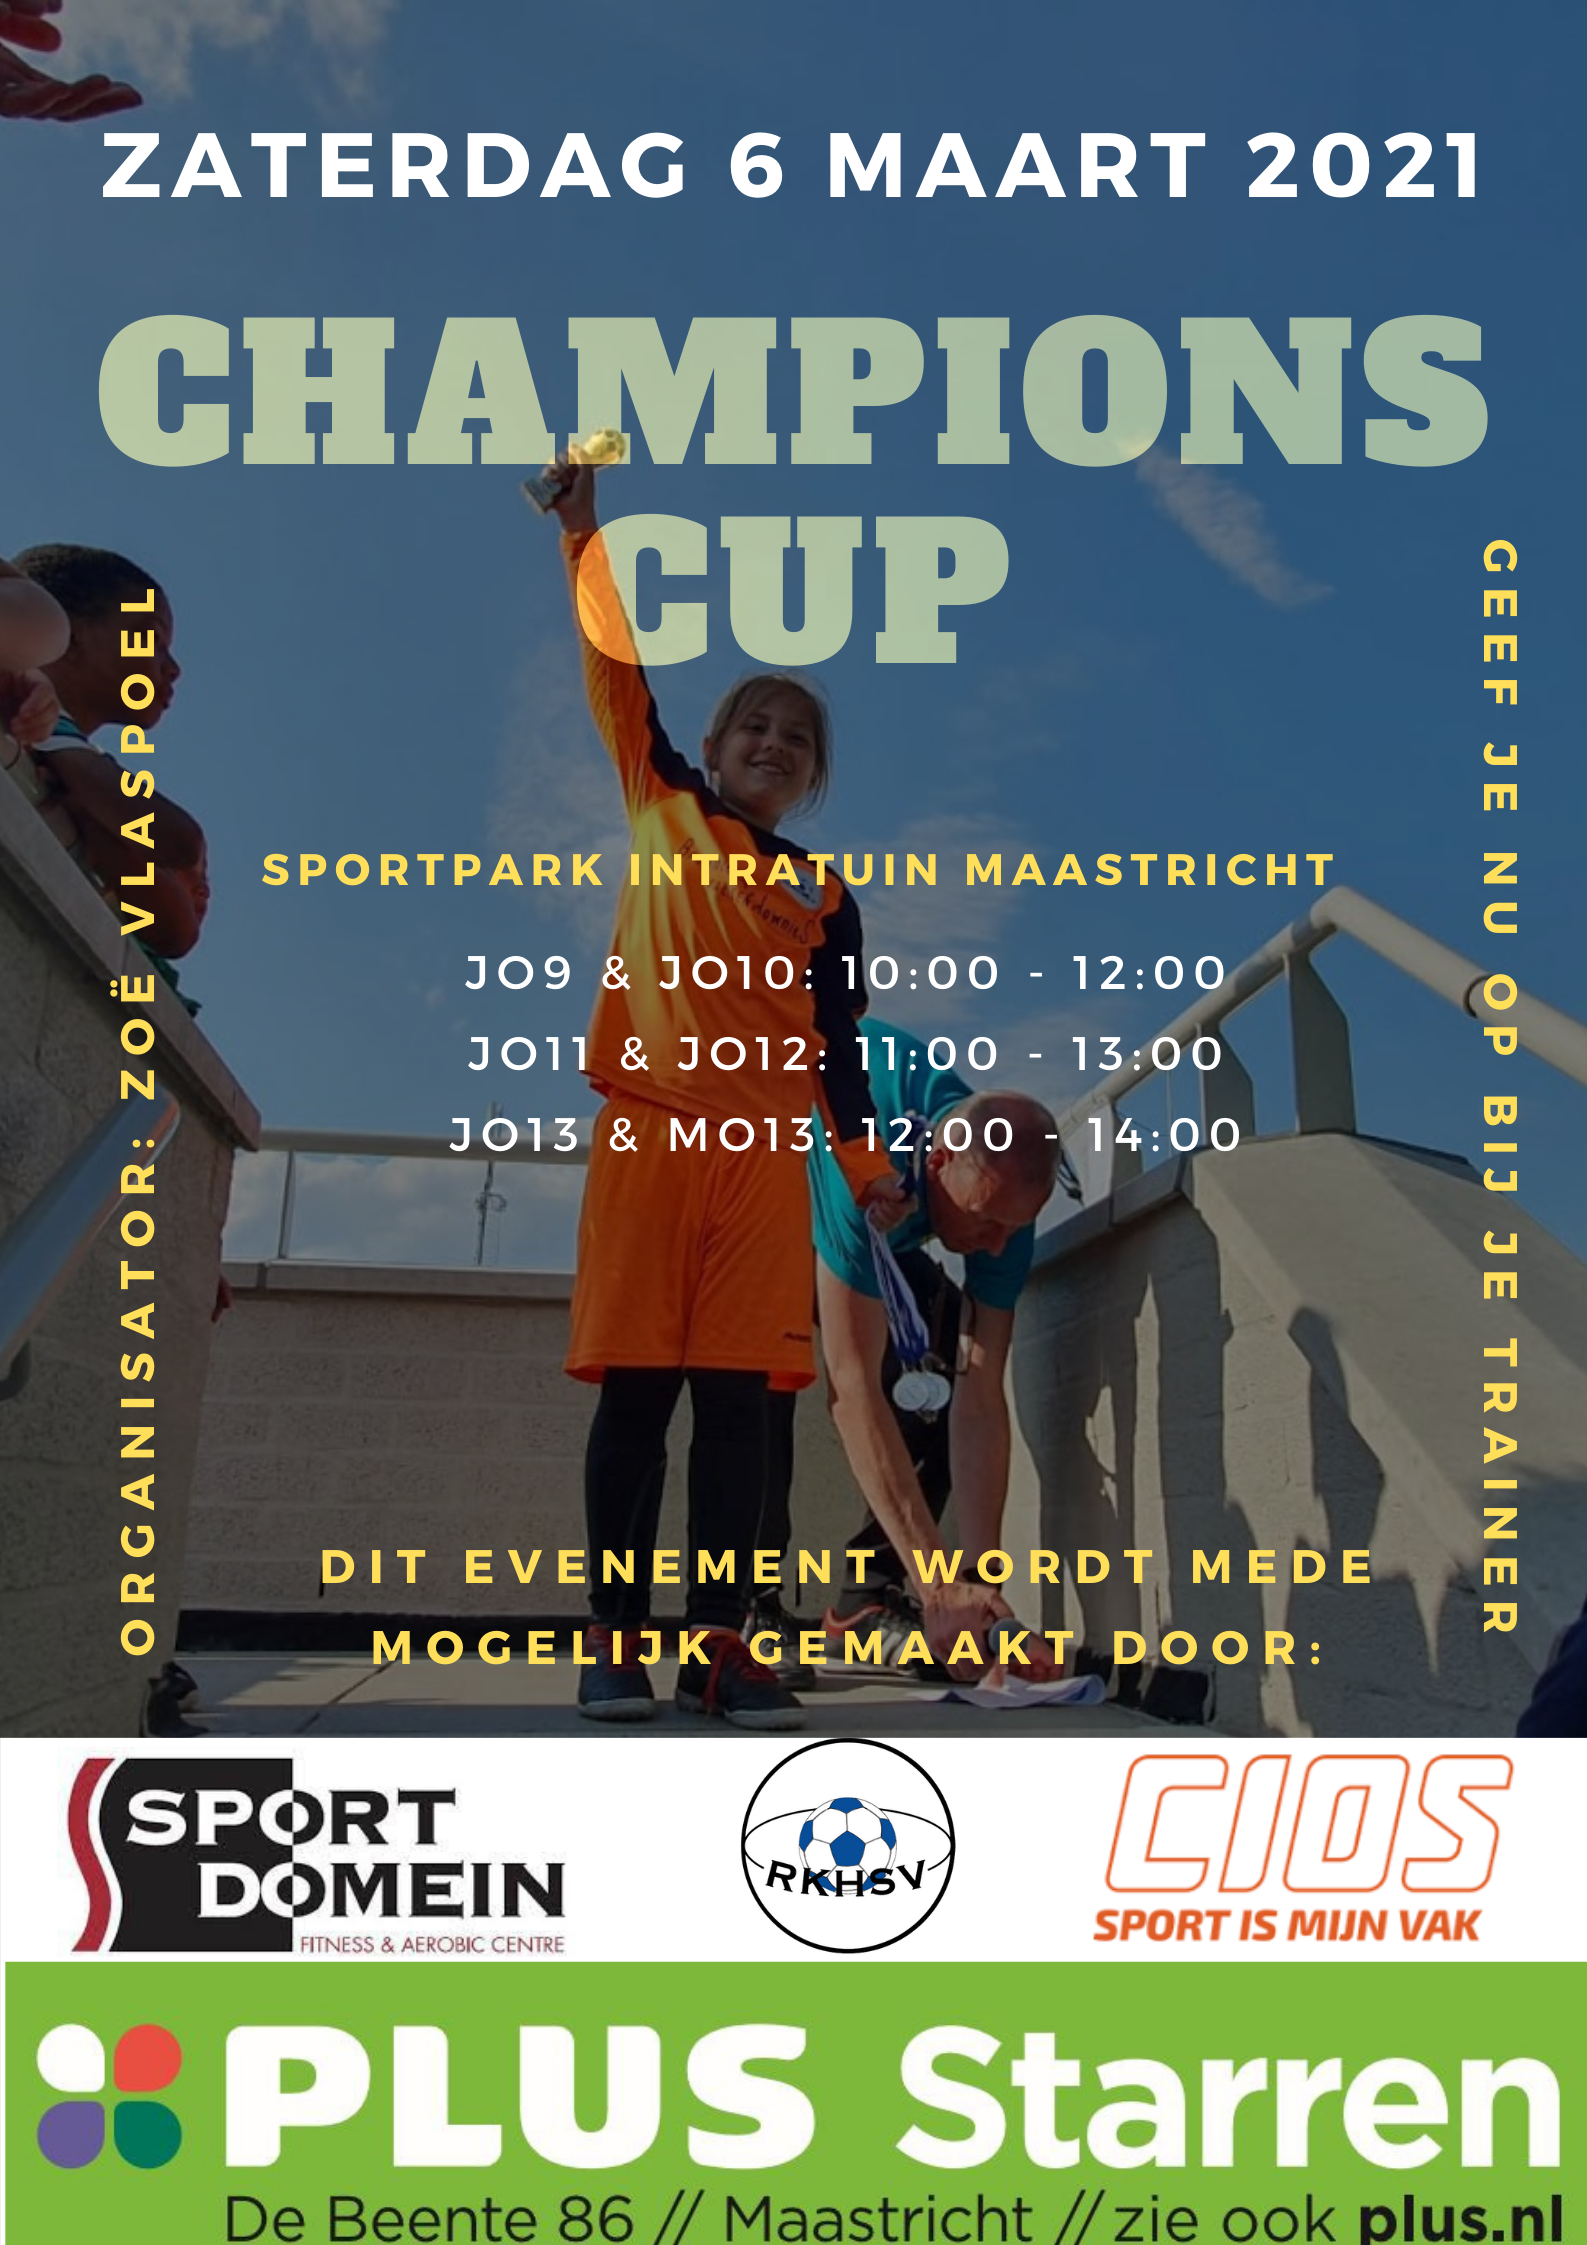 Teamindelingen Champions Cup